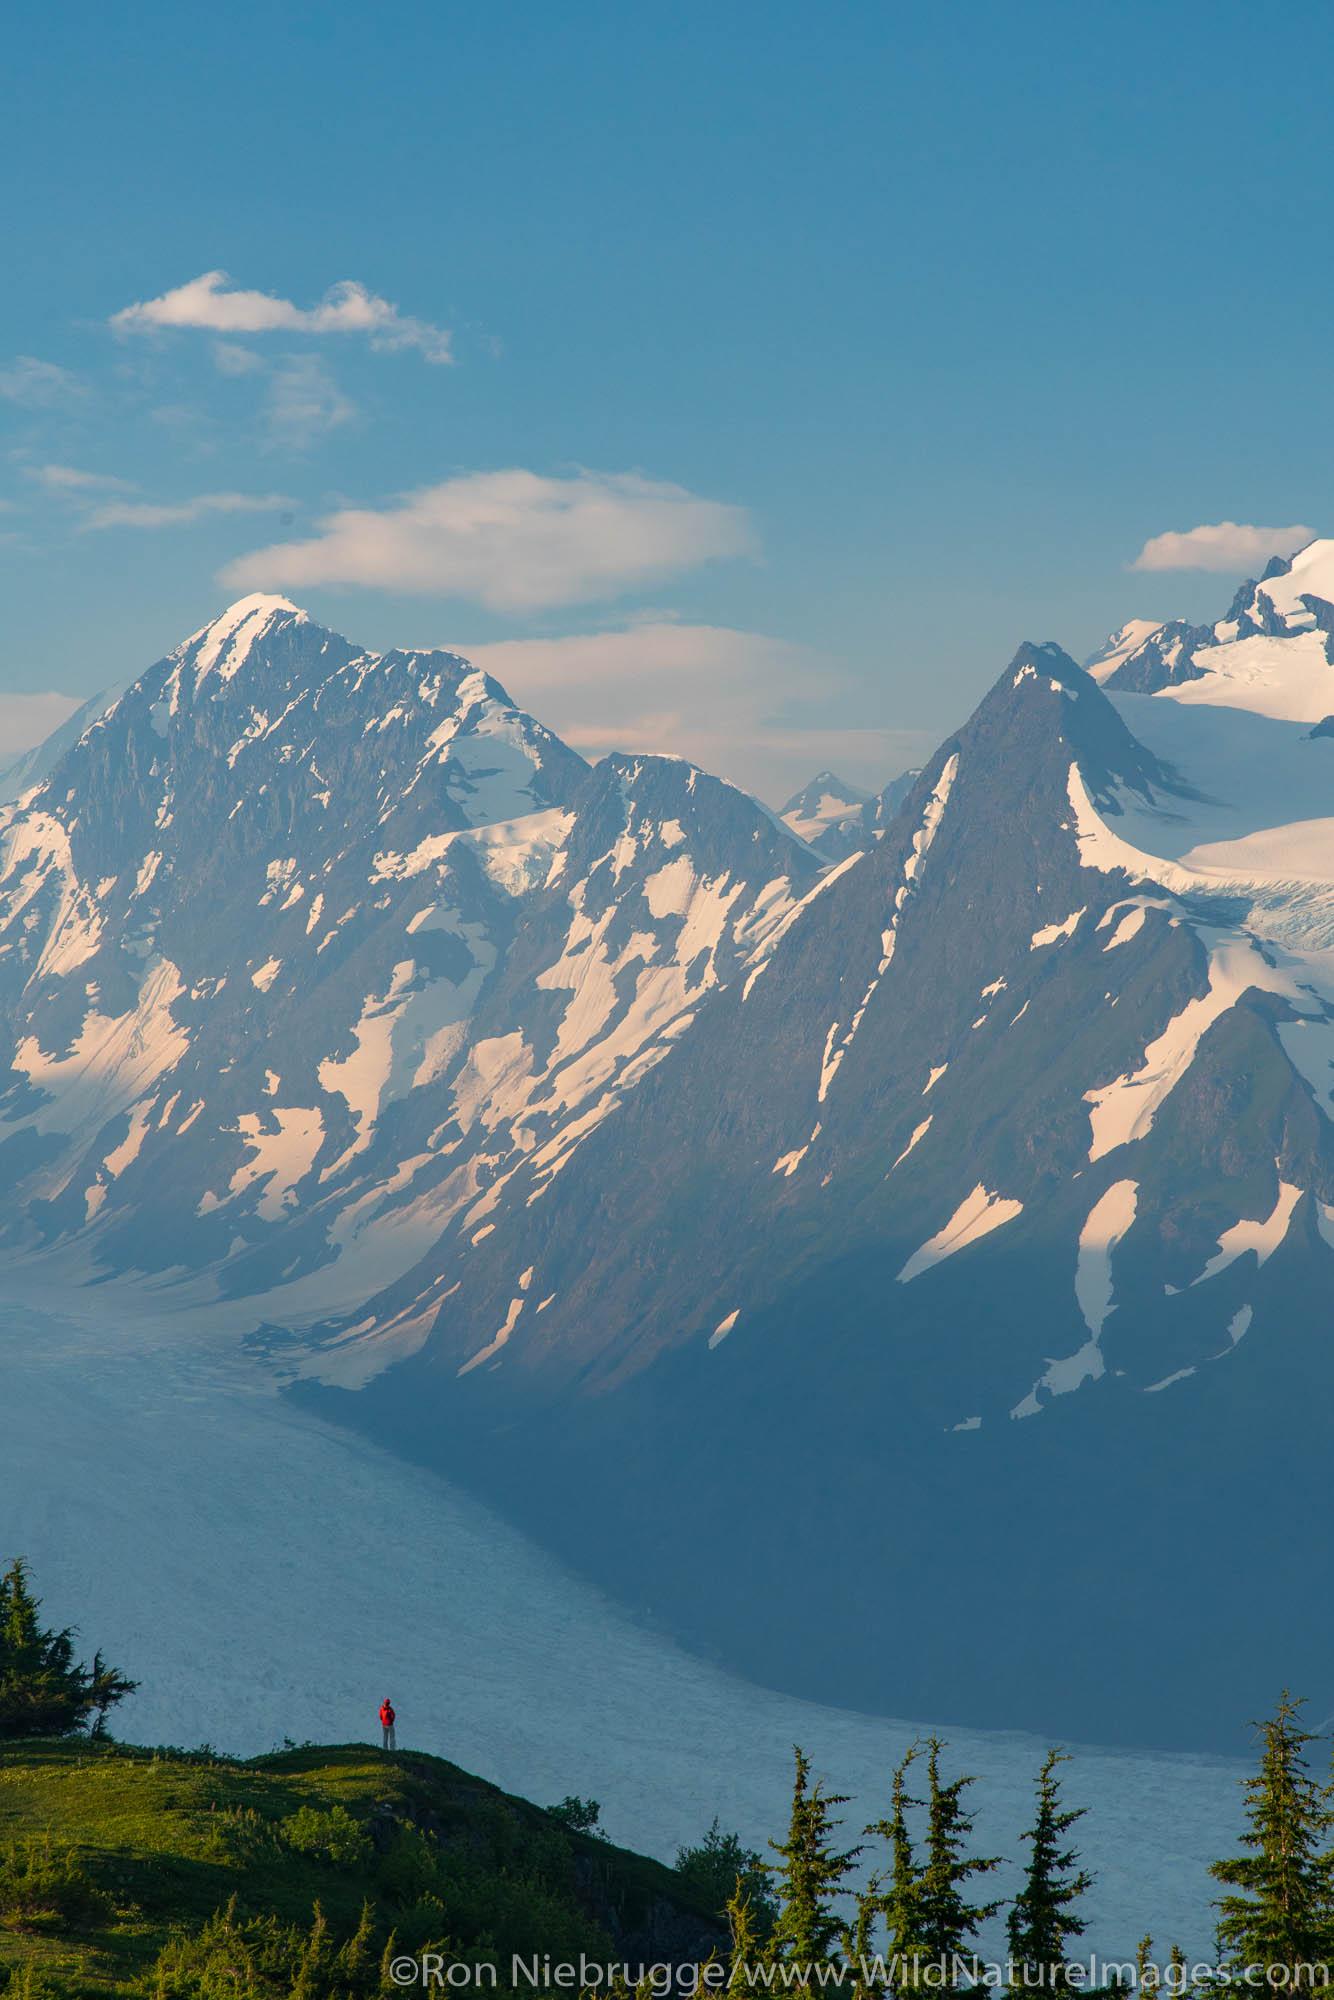 Backpacking trip to the Spencer Glacier Bench, Chugach National Forest, Alaska.